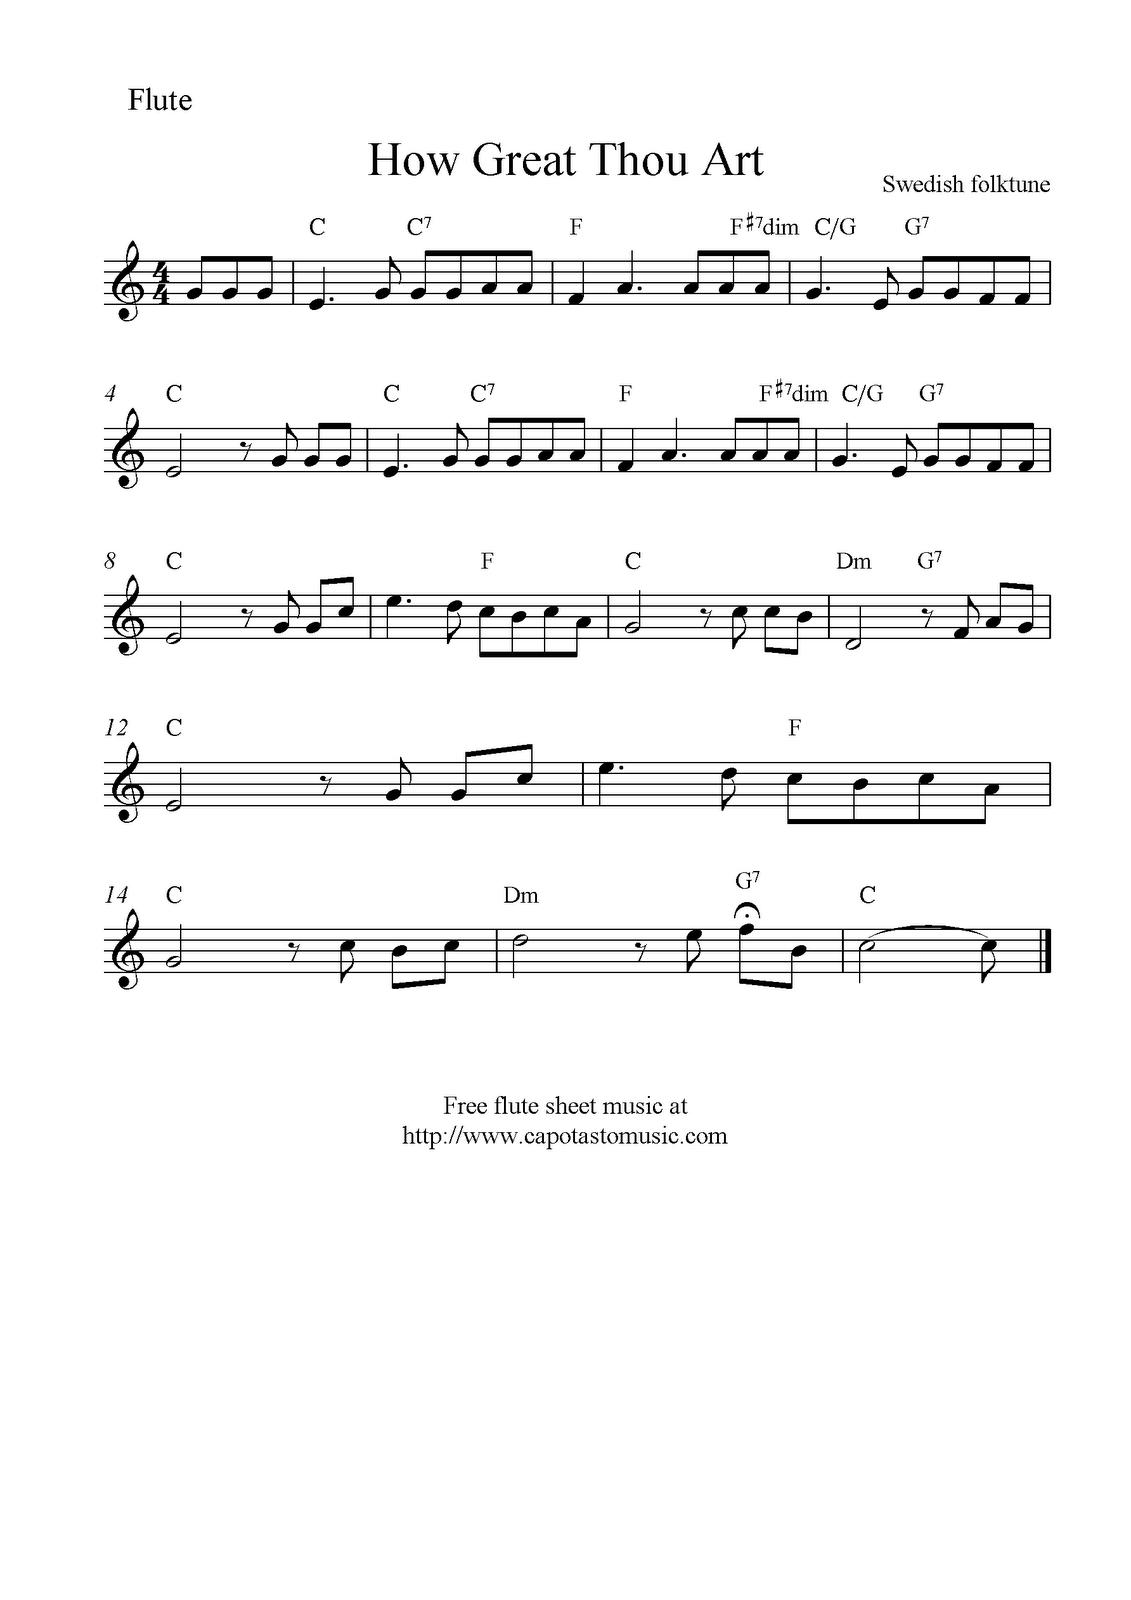 How Great Thou Art, Free Christian Flute Sheet Music Notes - Free Printable Flute Sheet Music